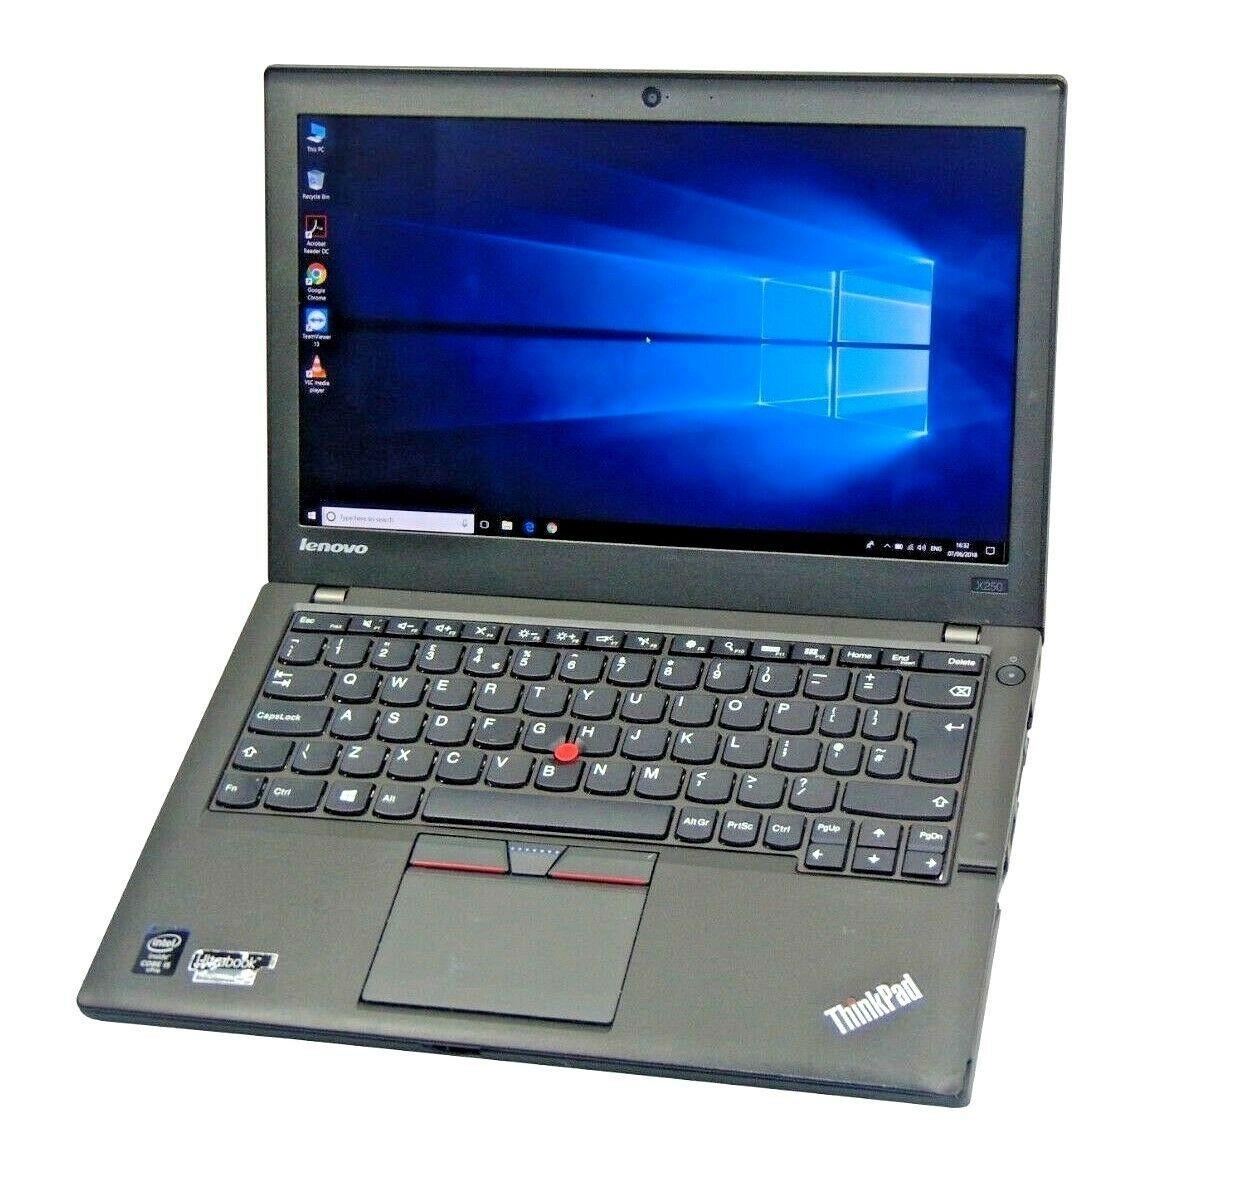 Core I5 5th Gen 2 3ghz 120gb Ssd 8gb Laptop Lenovo Thinkpad X250 12 5 Notebook Lenovo Thinkpad Lenovo Ssd